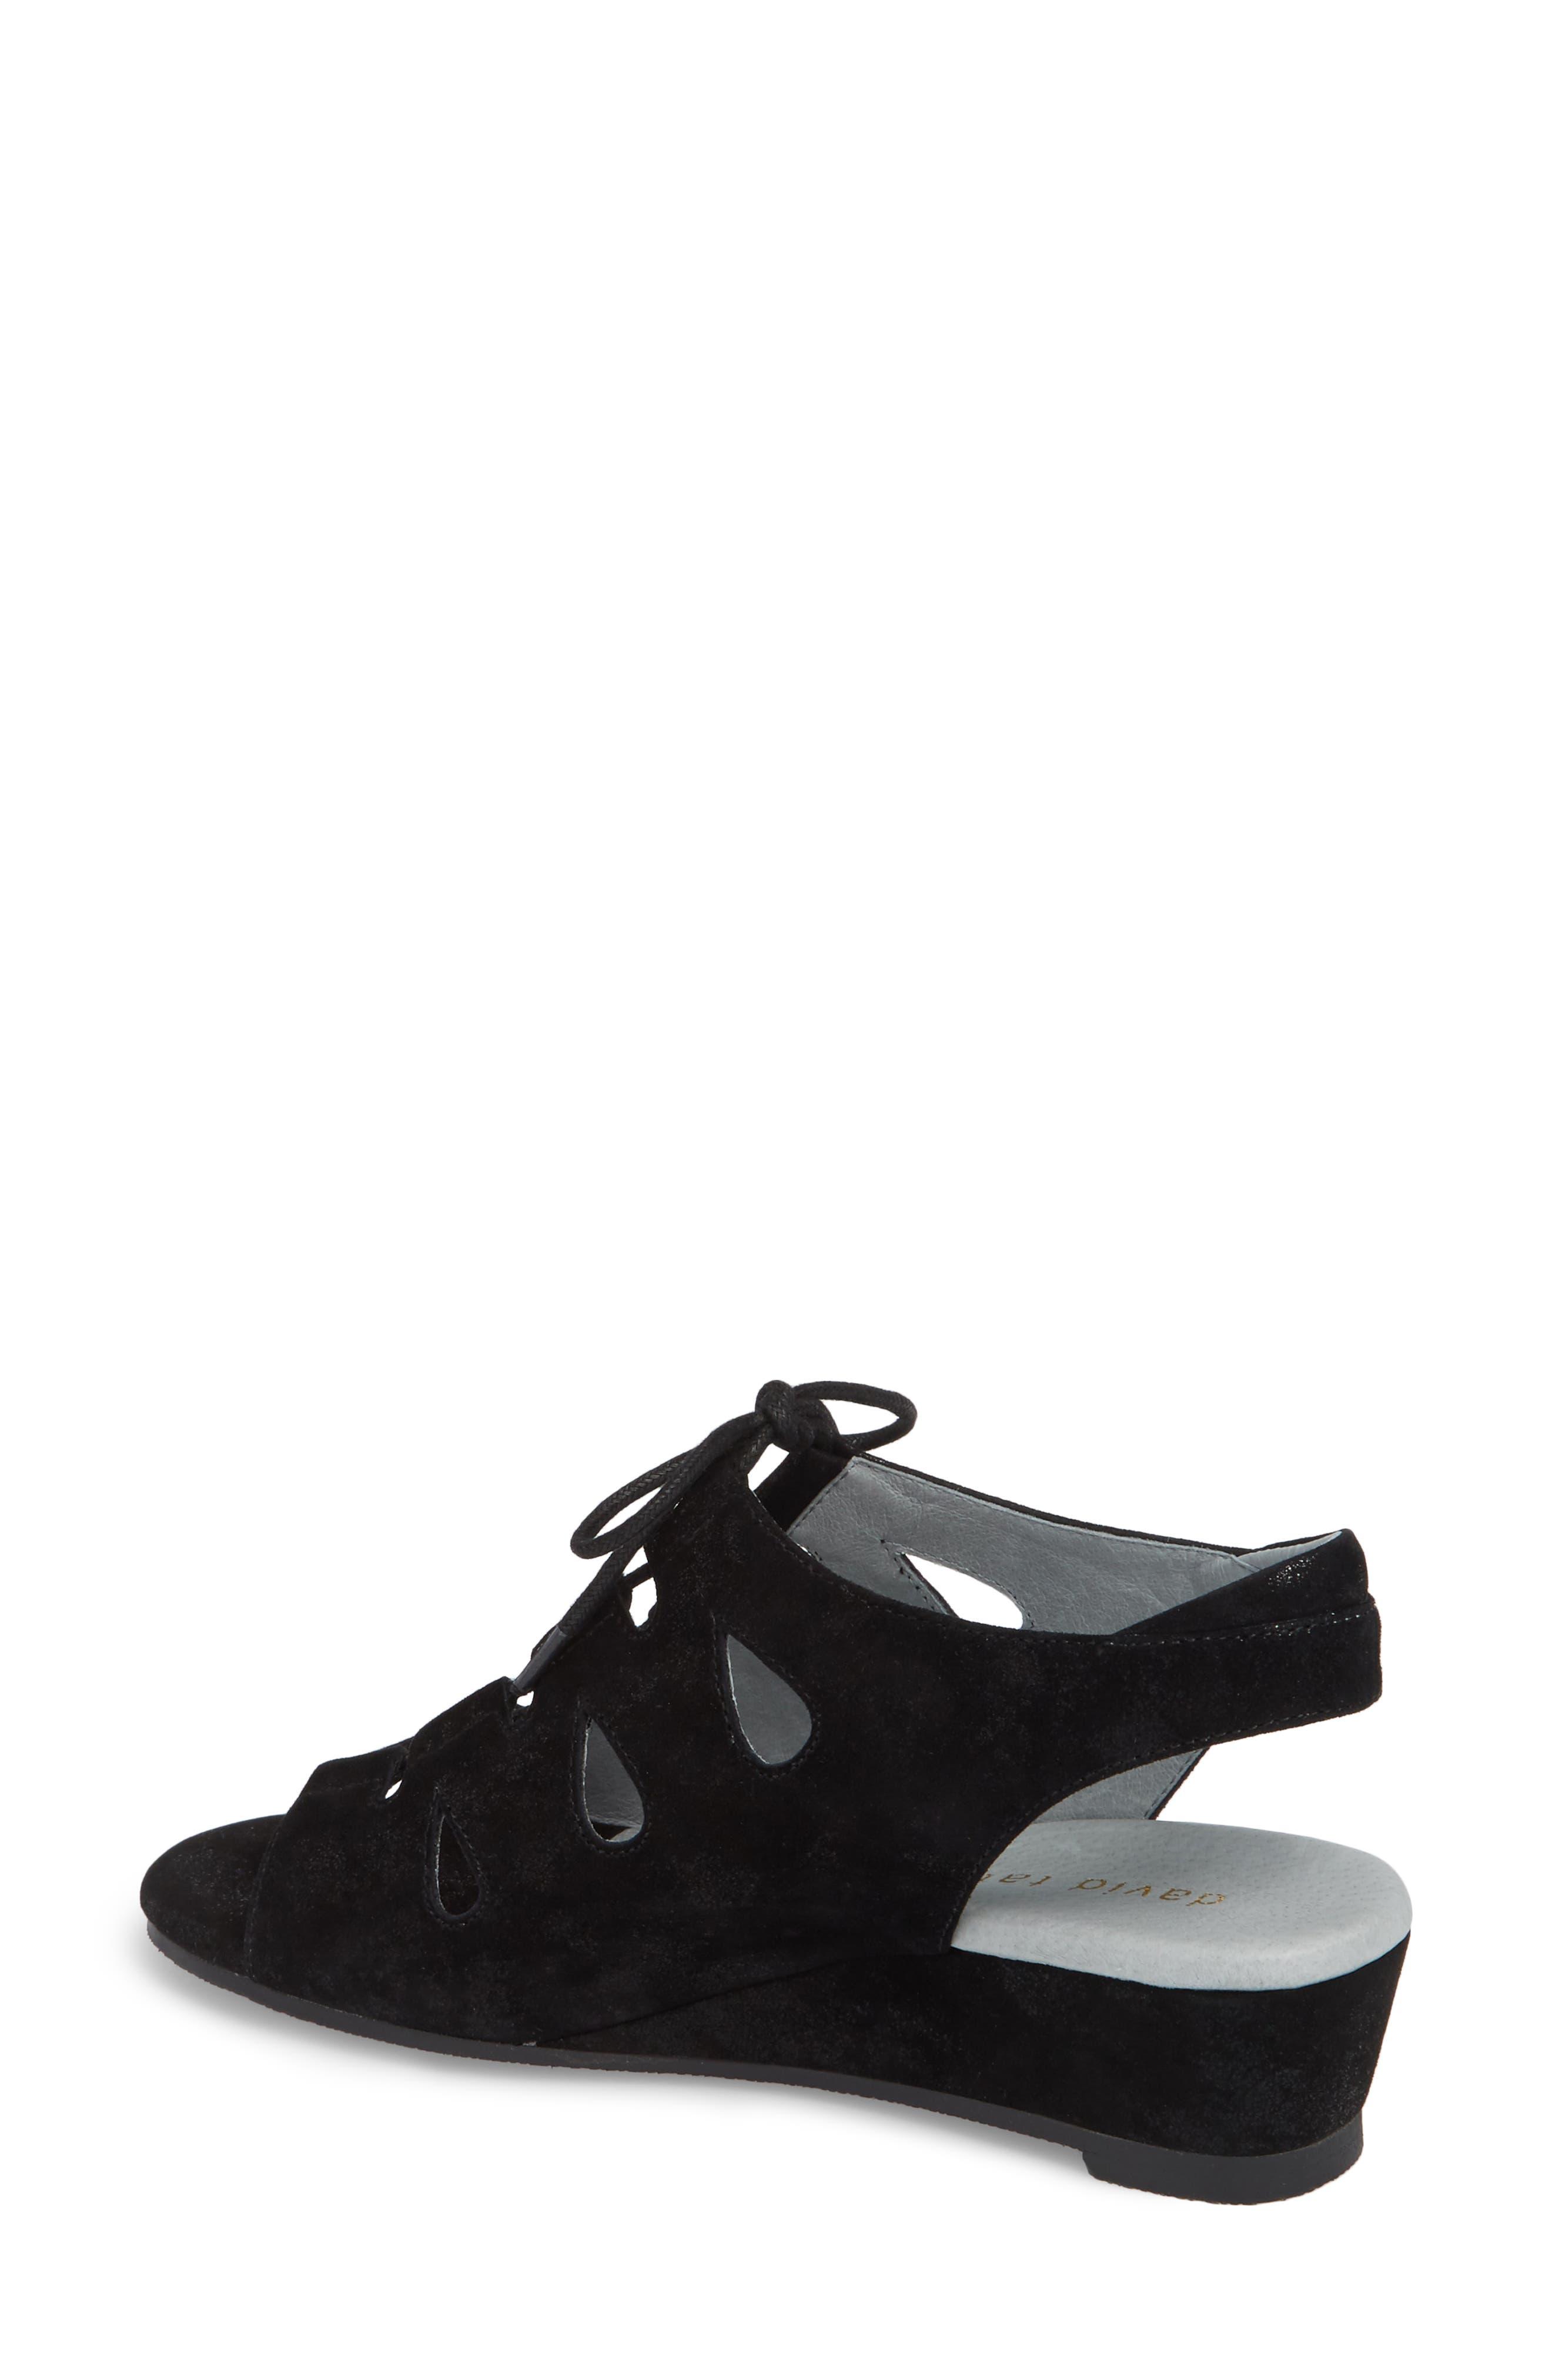 DAVID TATE, Rich Wedge Sandal, Alternate thumbnail 2, color, BLACK SUEDE